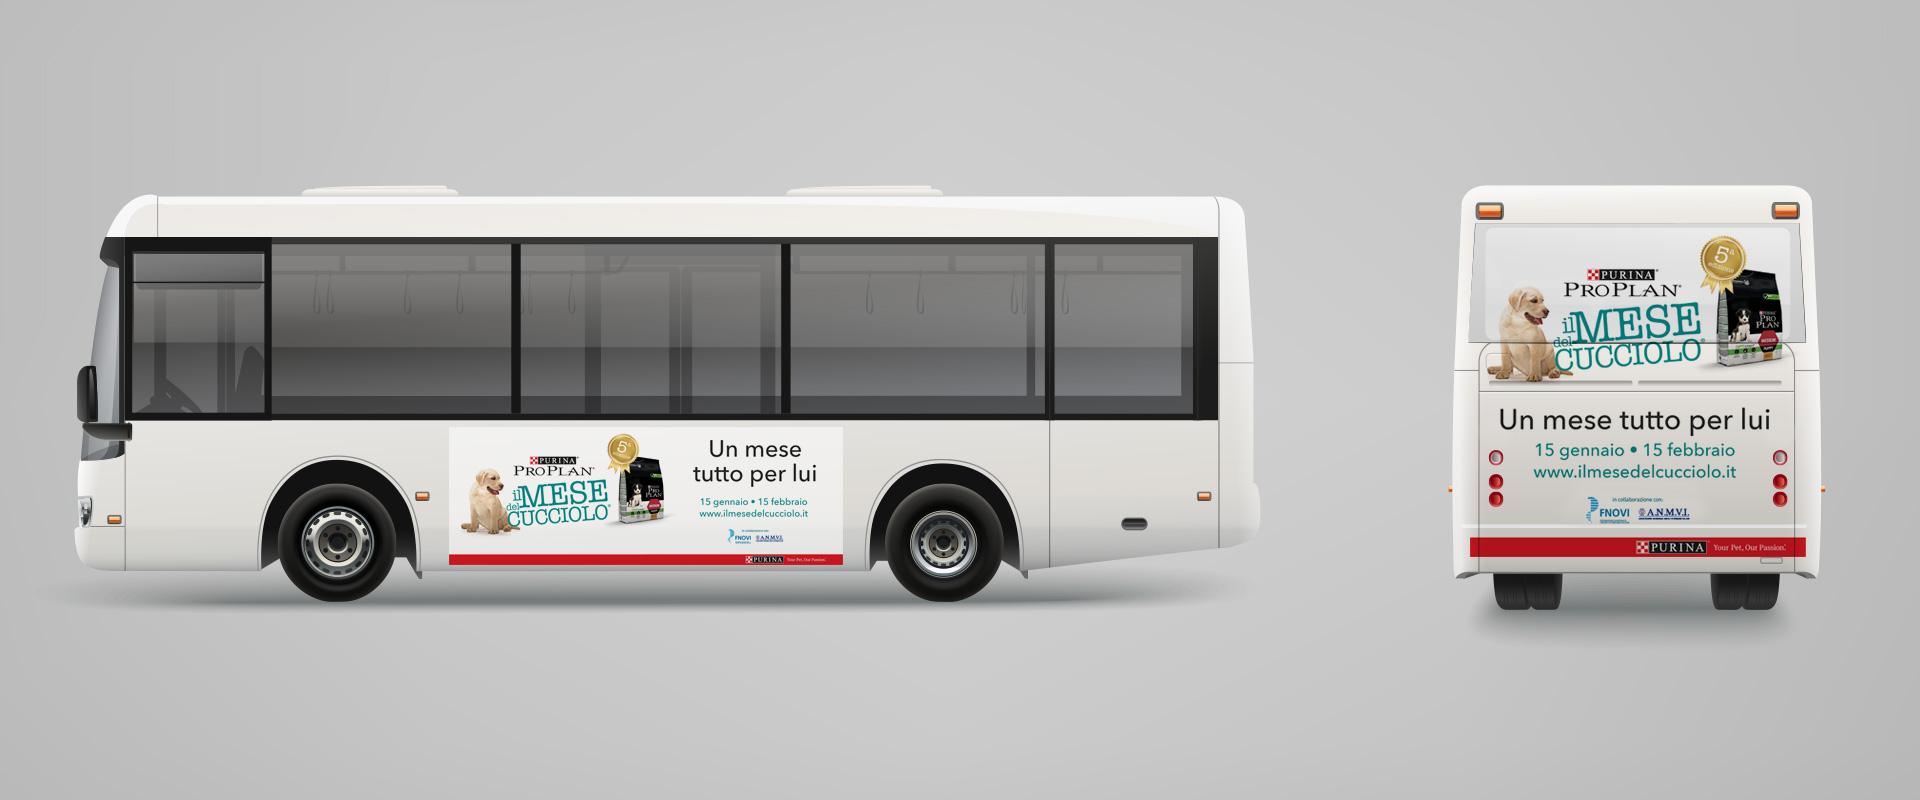 Mese del Cucciolo Purina Pro Plan advertising pubblicità outdoor